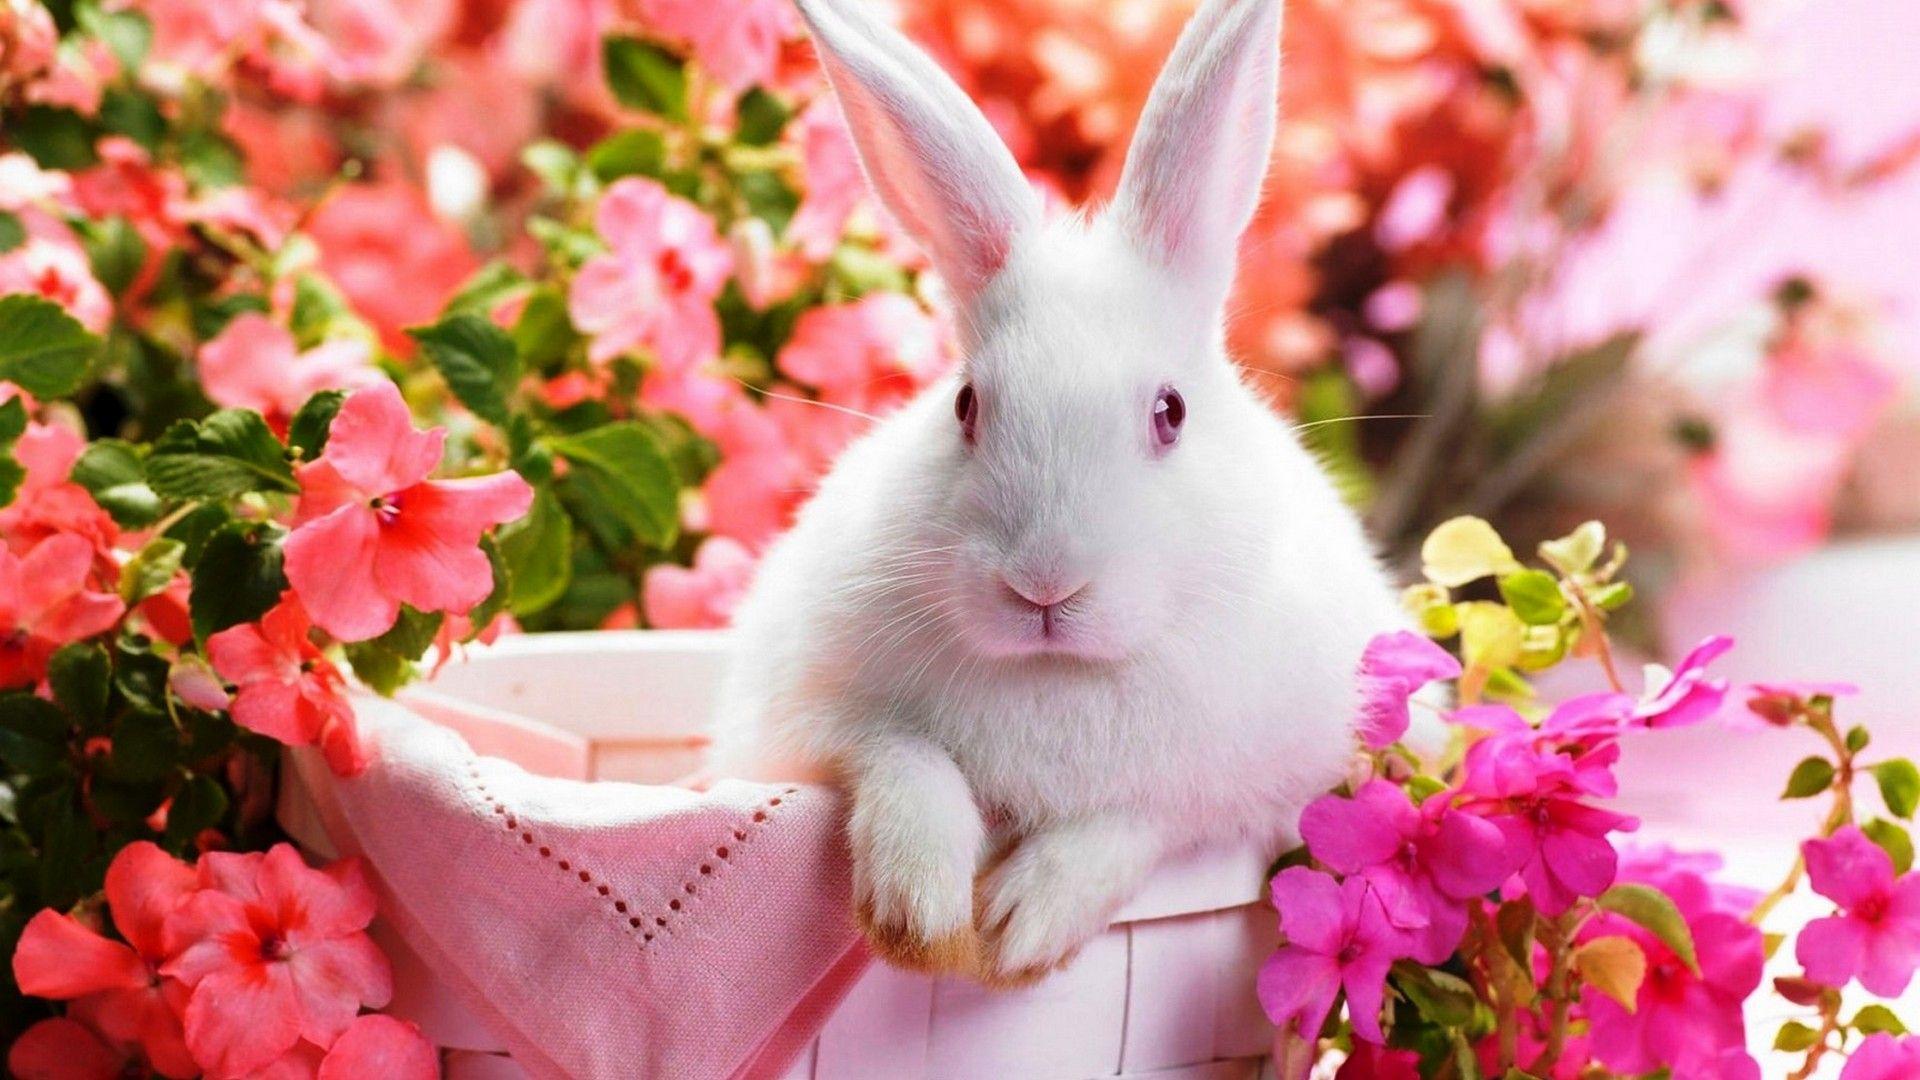 Cute Rabbit Wallpaper HD Rabbit wallpaper, Easter